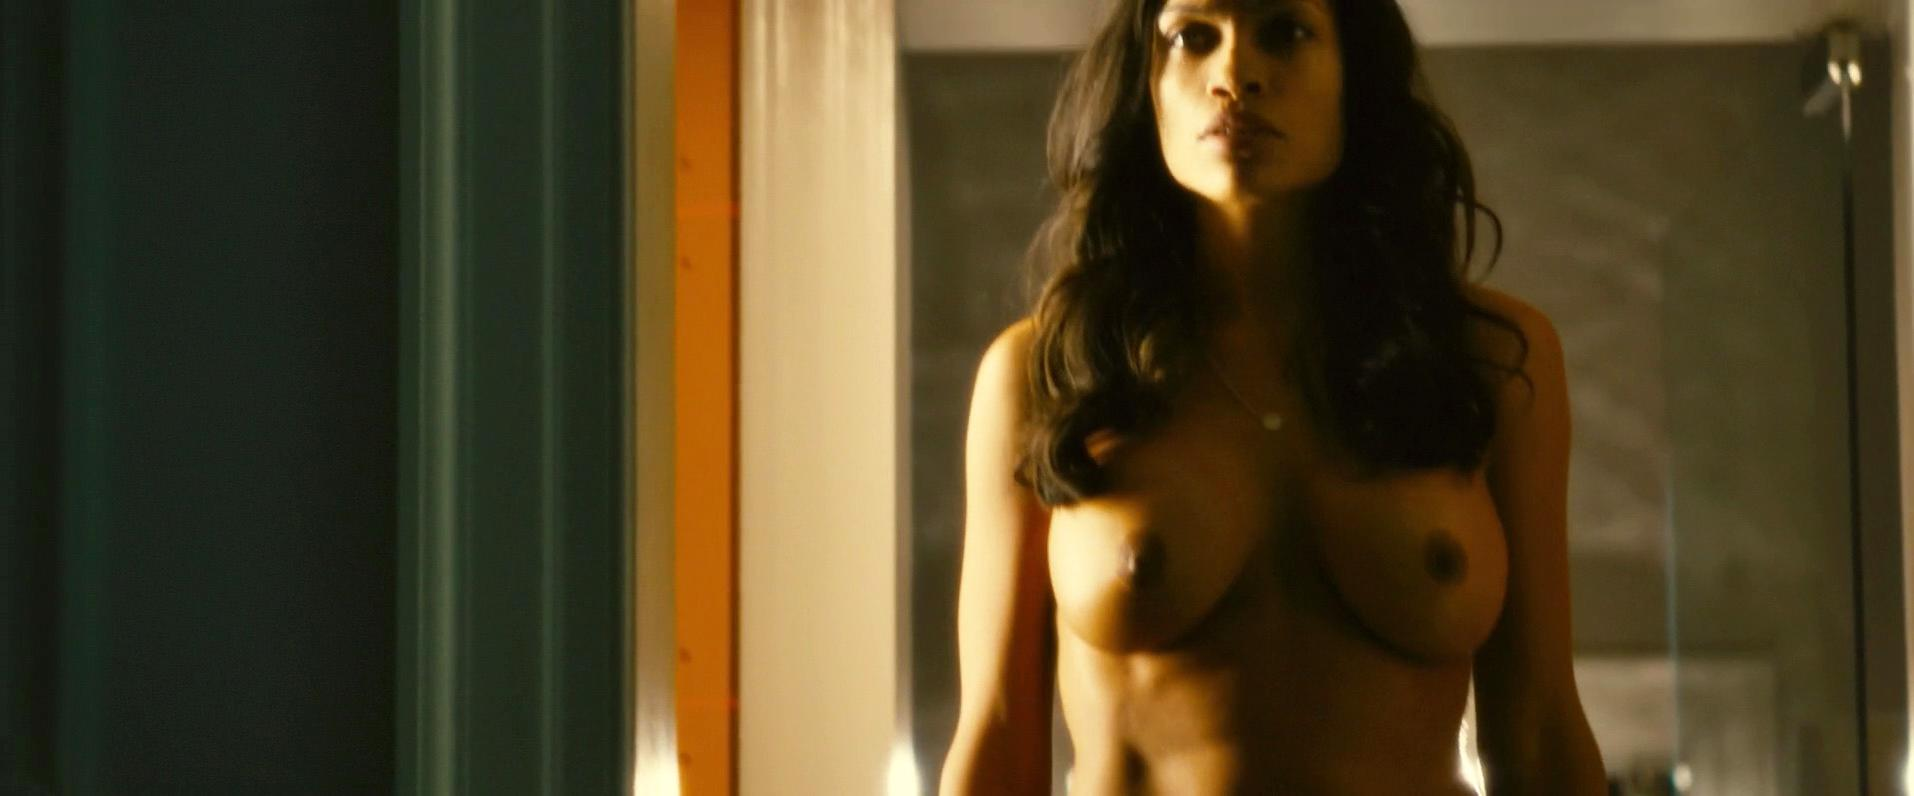 Nude Video Celebs  Rosario Dawson Nude - Trance 2013-5400